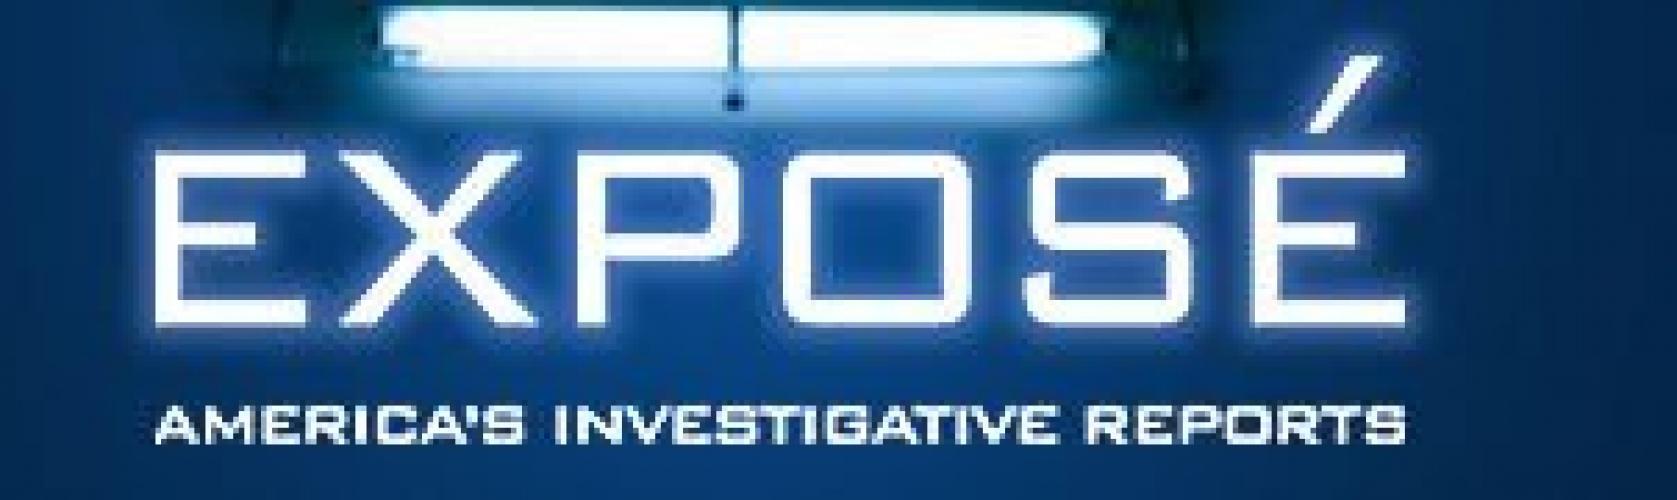 Exposé: America's Investigative Reports next episode air date poster